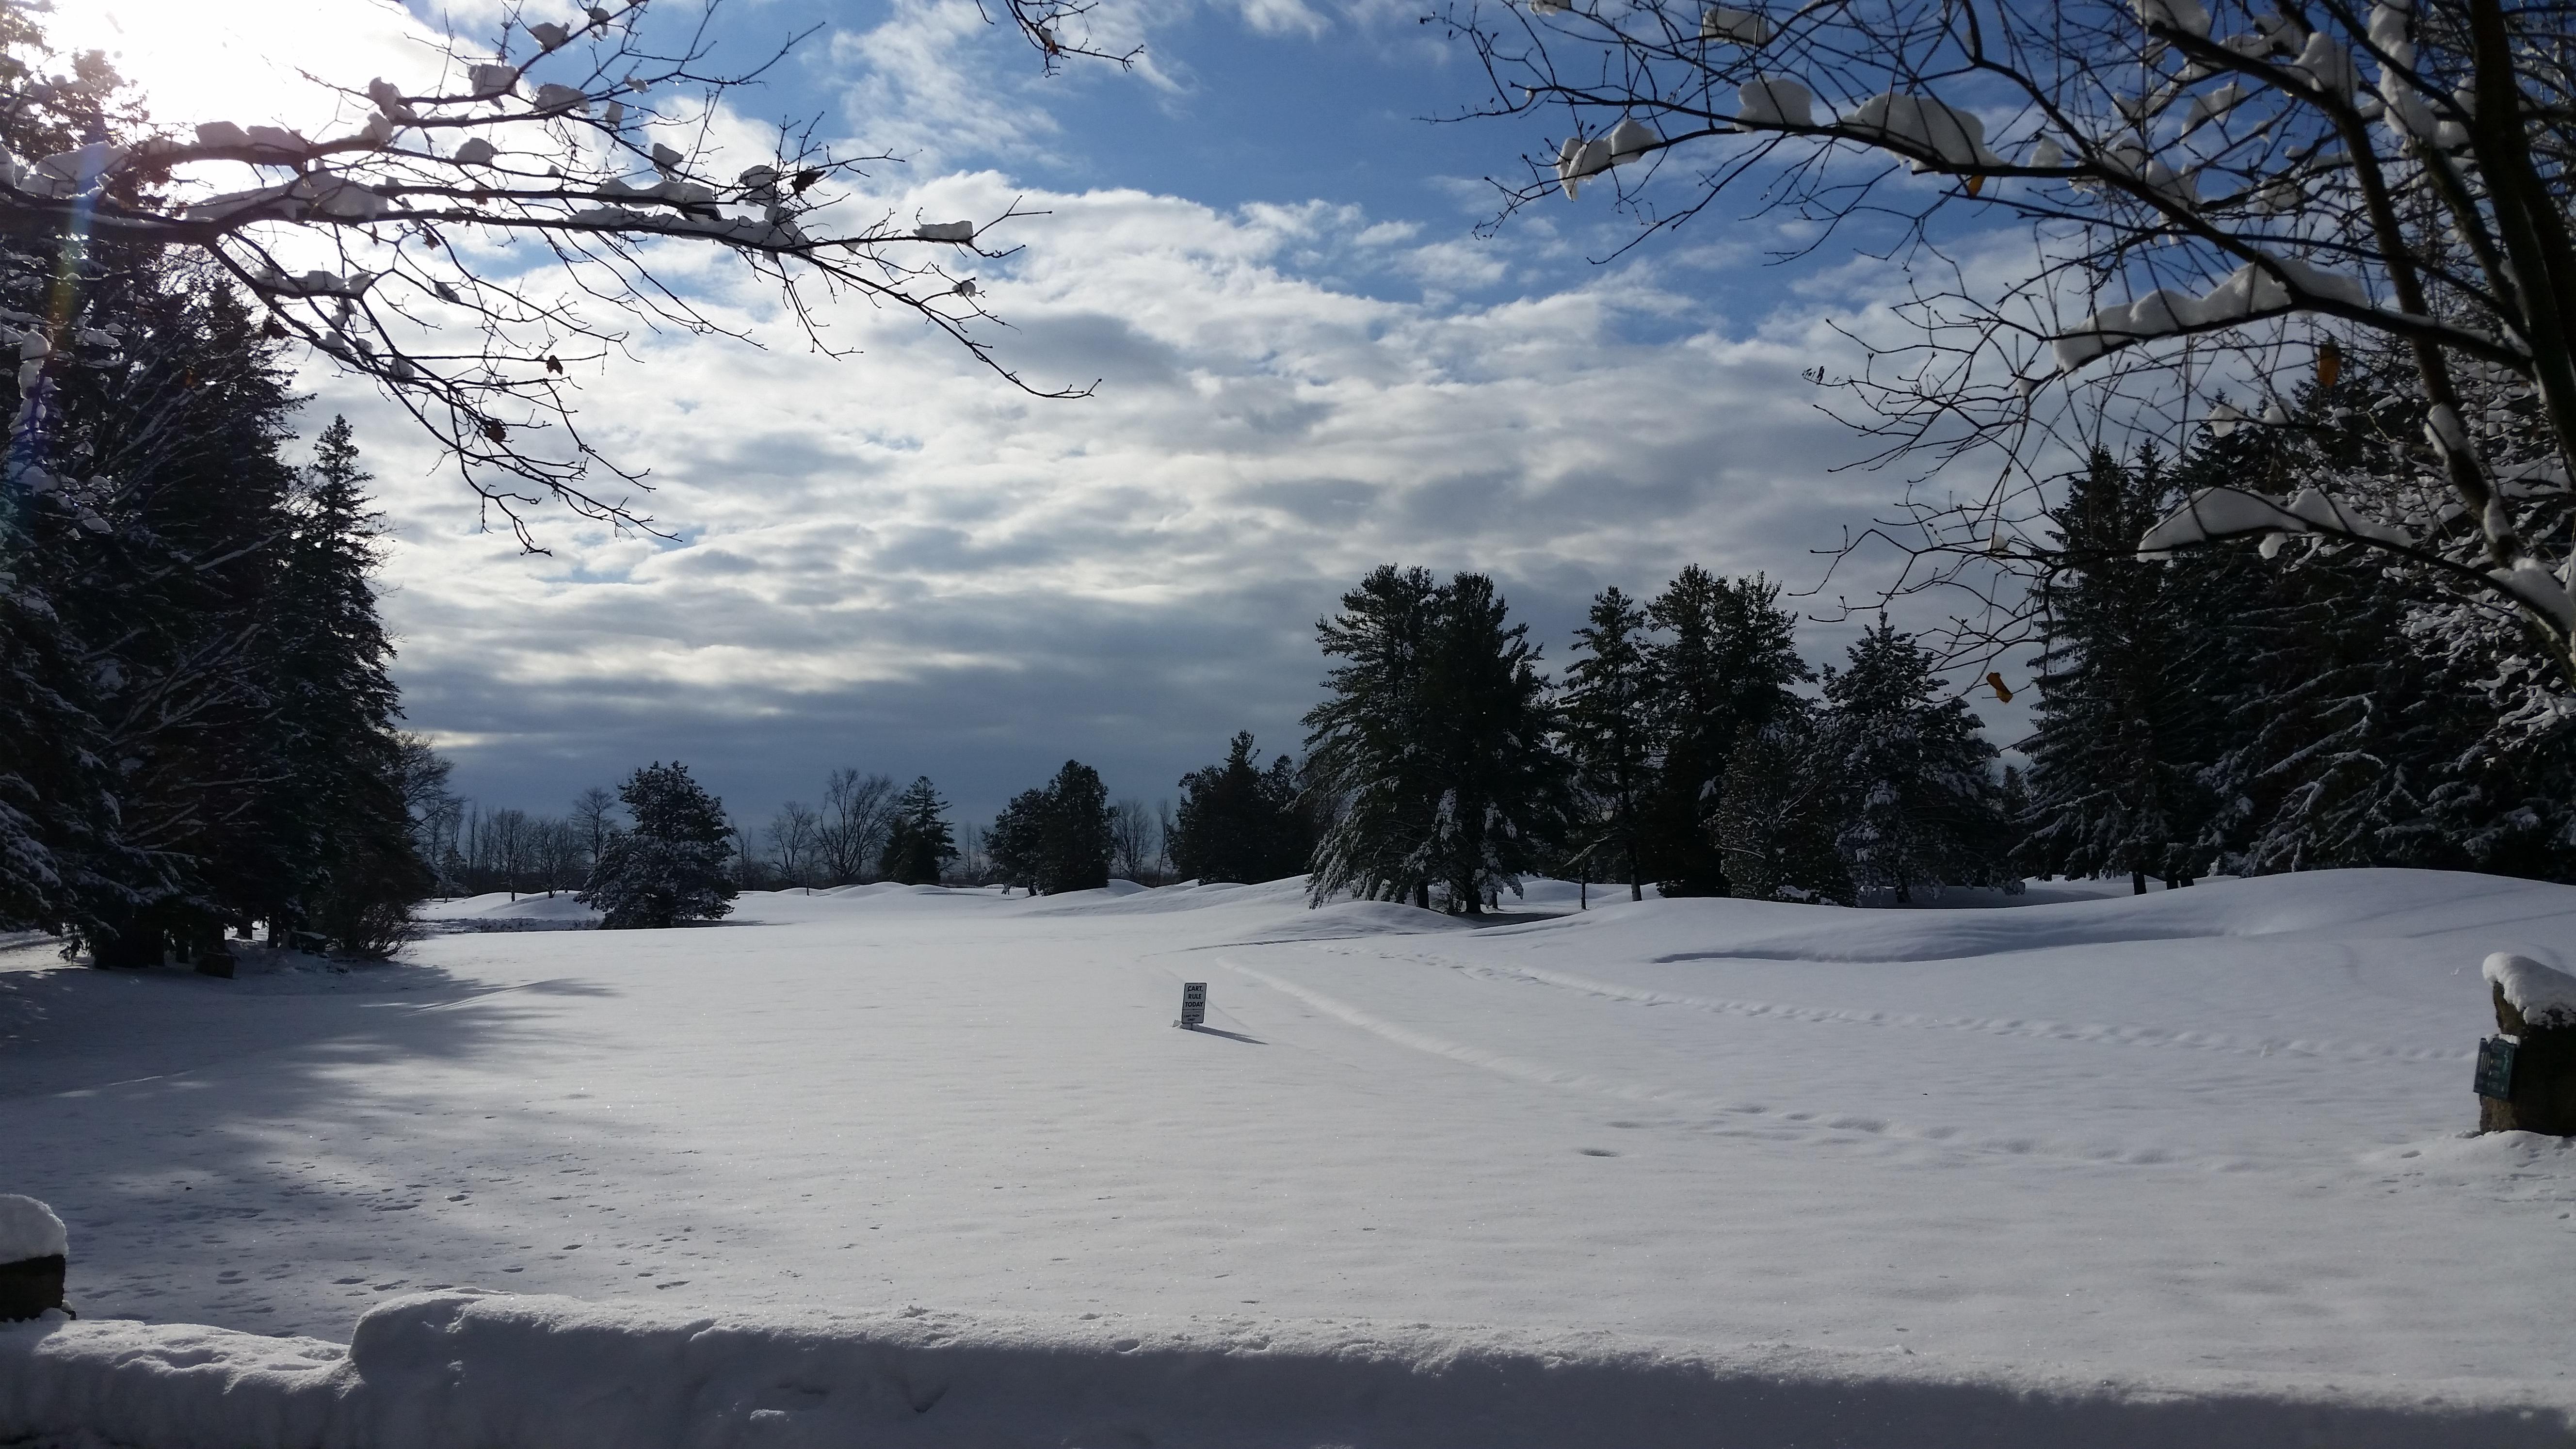 A winter day in November